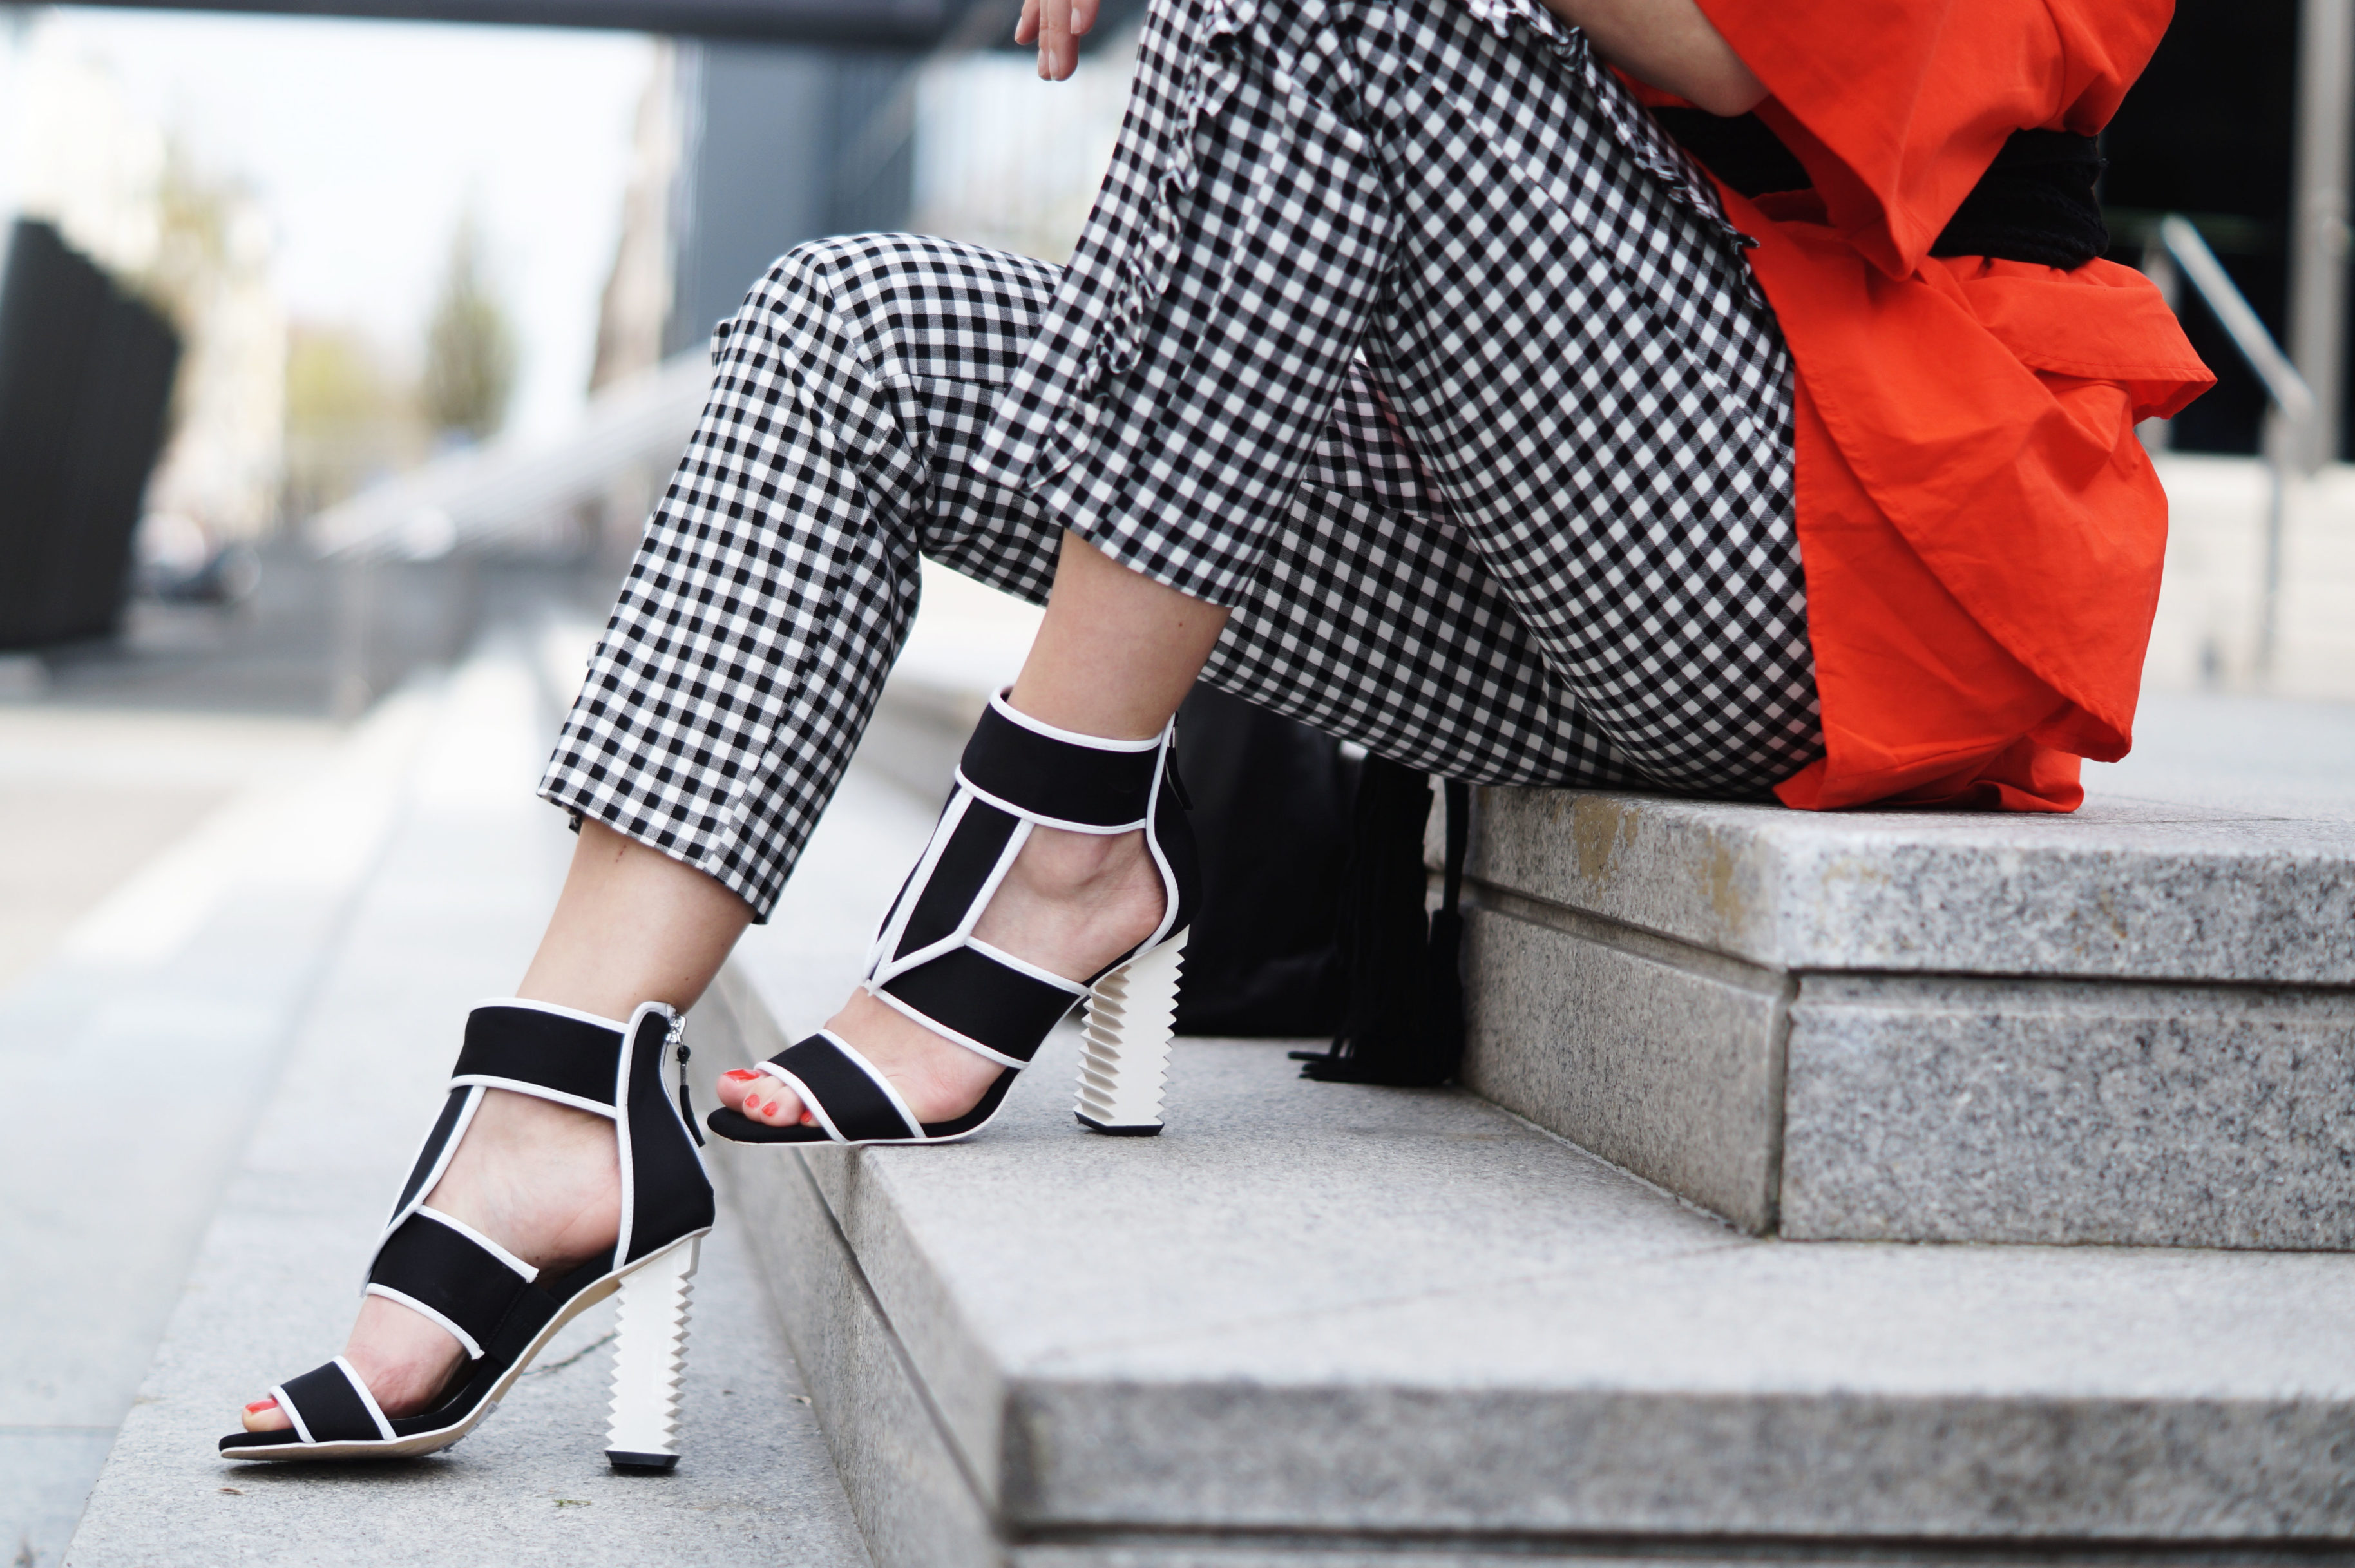 Vichy-Karo-Ruffle-Pants-Red-Volant-Dress-Gürtel-Passigatti-Outfit-Shooting-Streetstyle-Black-and-White-Schwarz-Weiß-Fashionblogger-Details-Modeblog-Sariety-e1492634769889